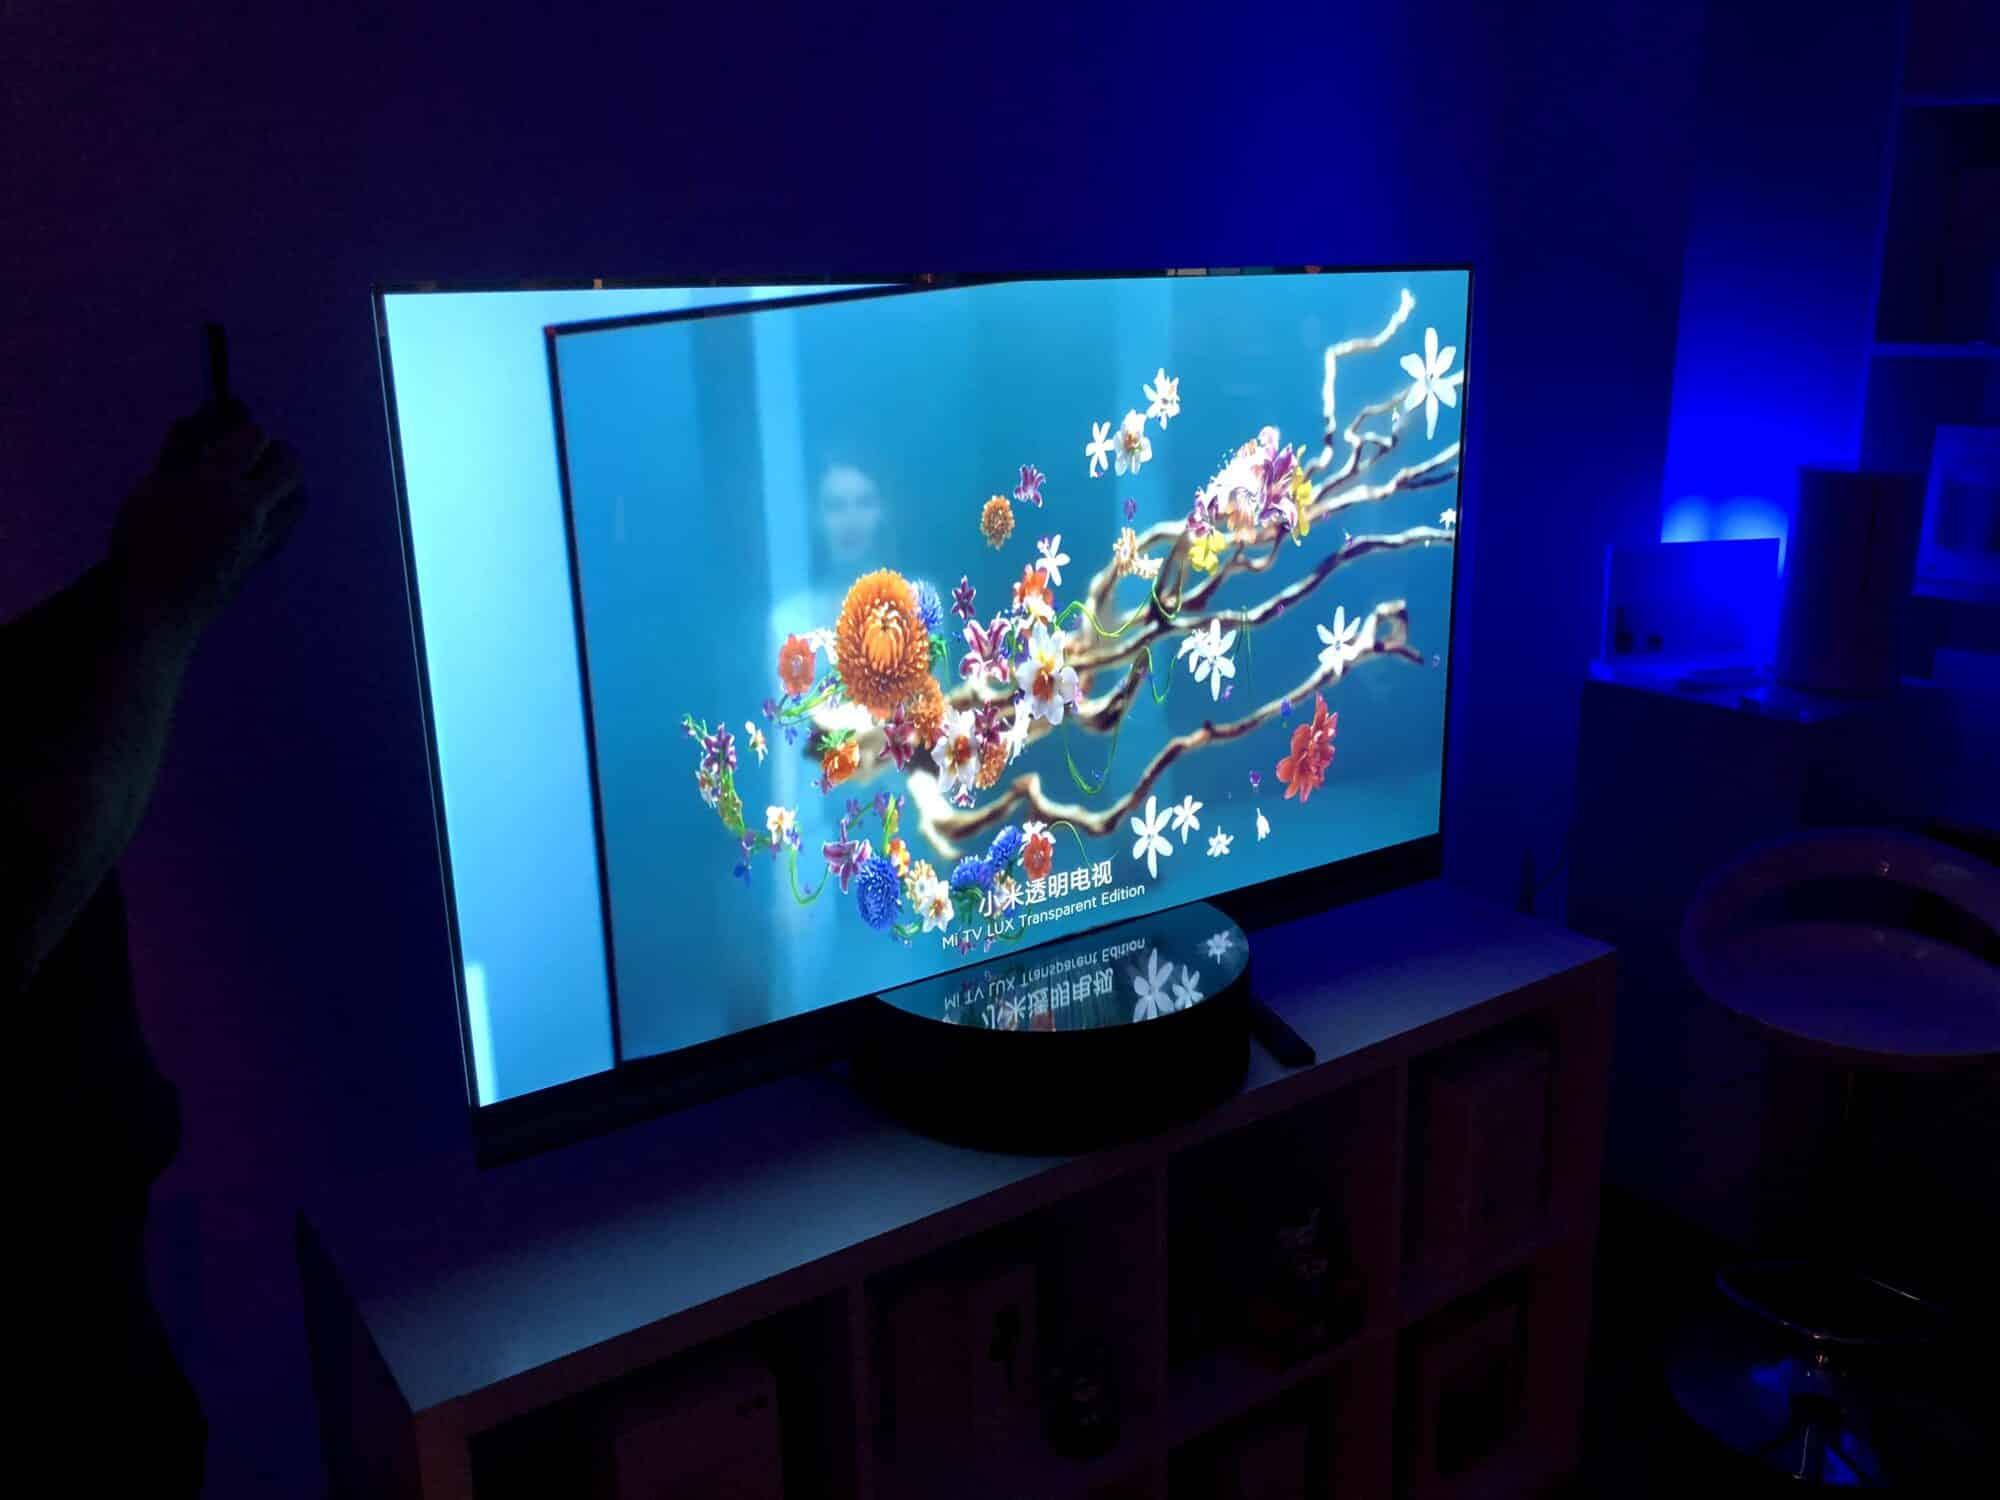 Mi Lux, MI LUX : Xiaomi propose une TV transparente innovante !